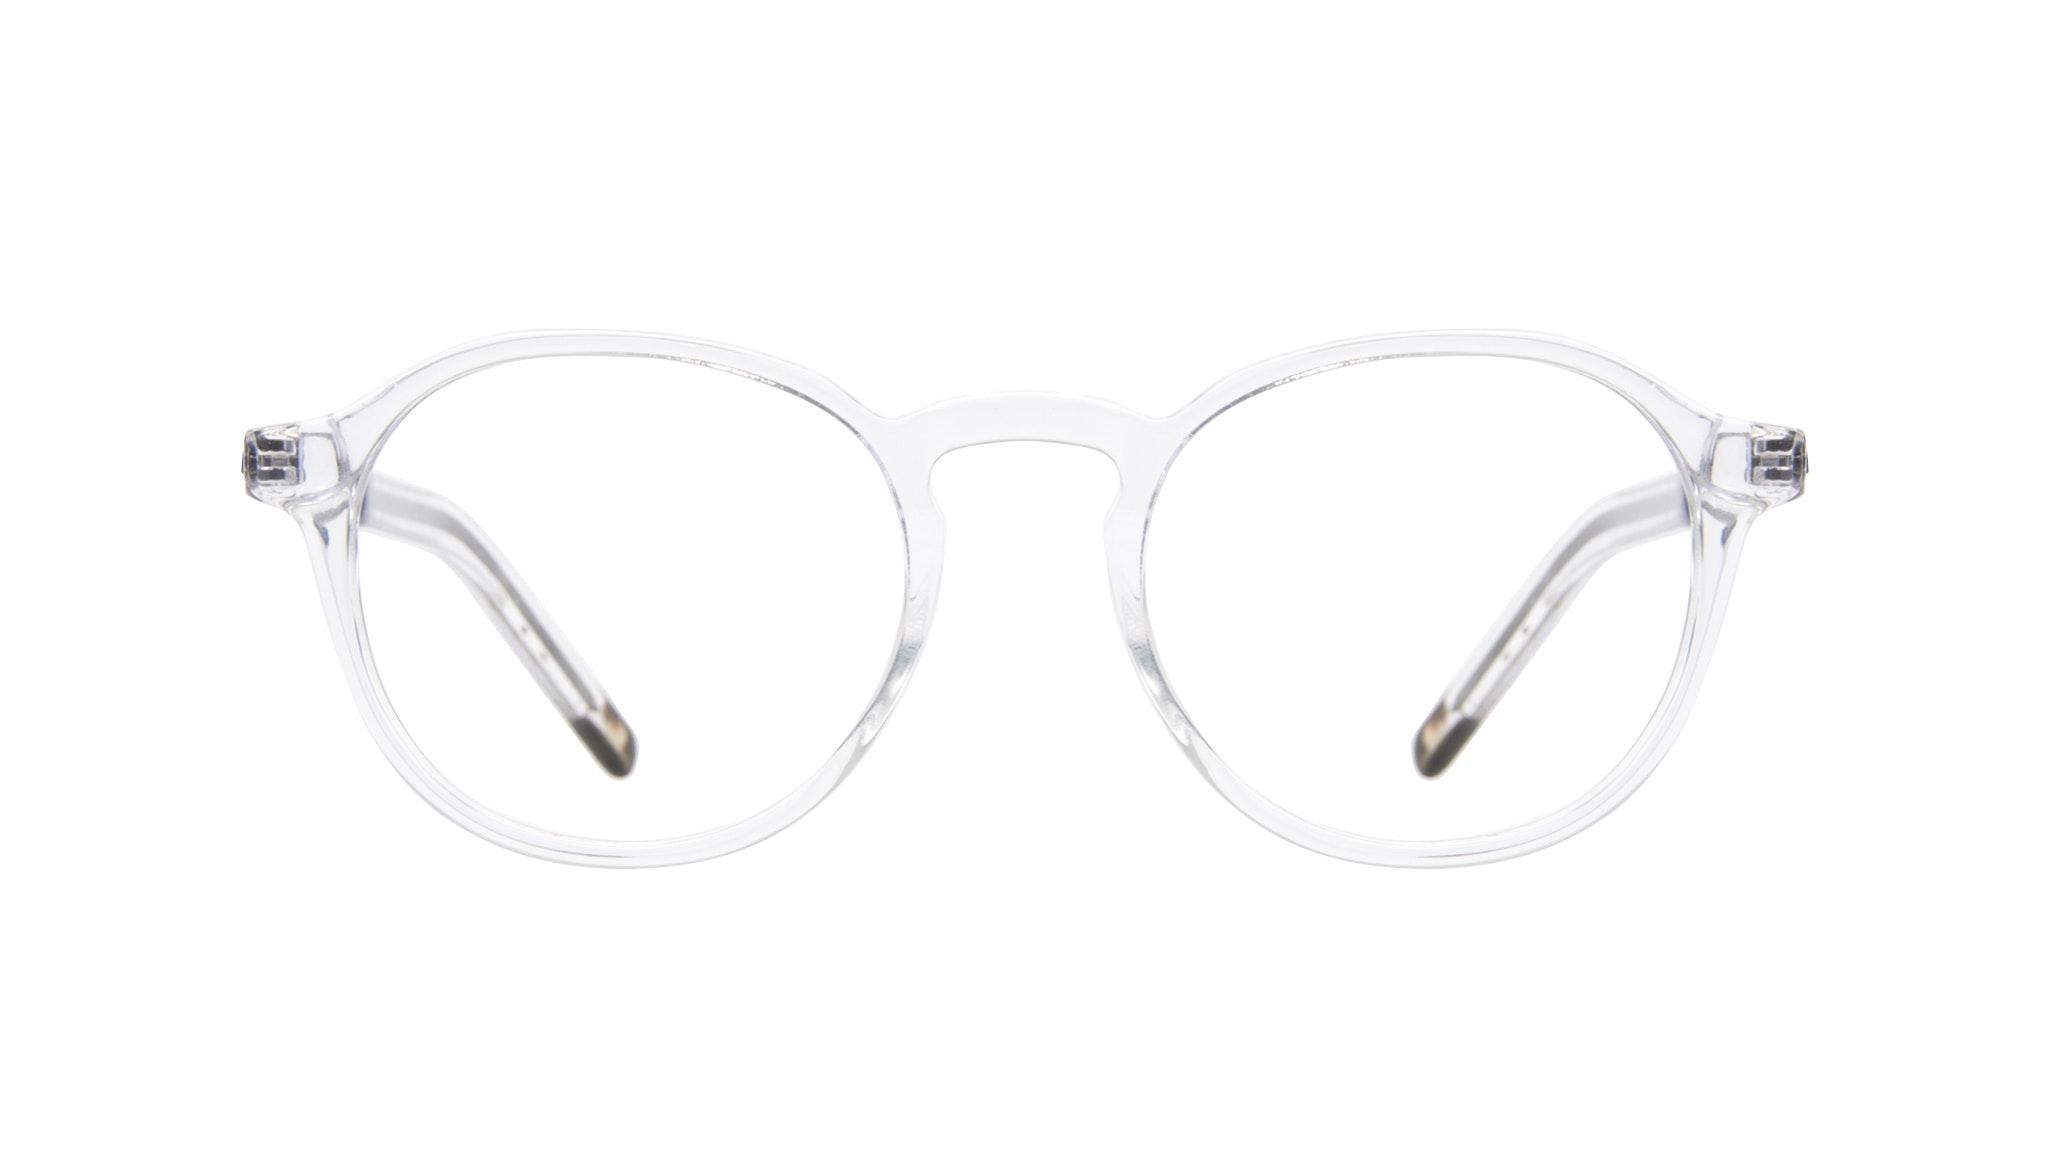 Affordable Fashion Glasses Round Eyeglasses Men Prime Clear